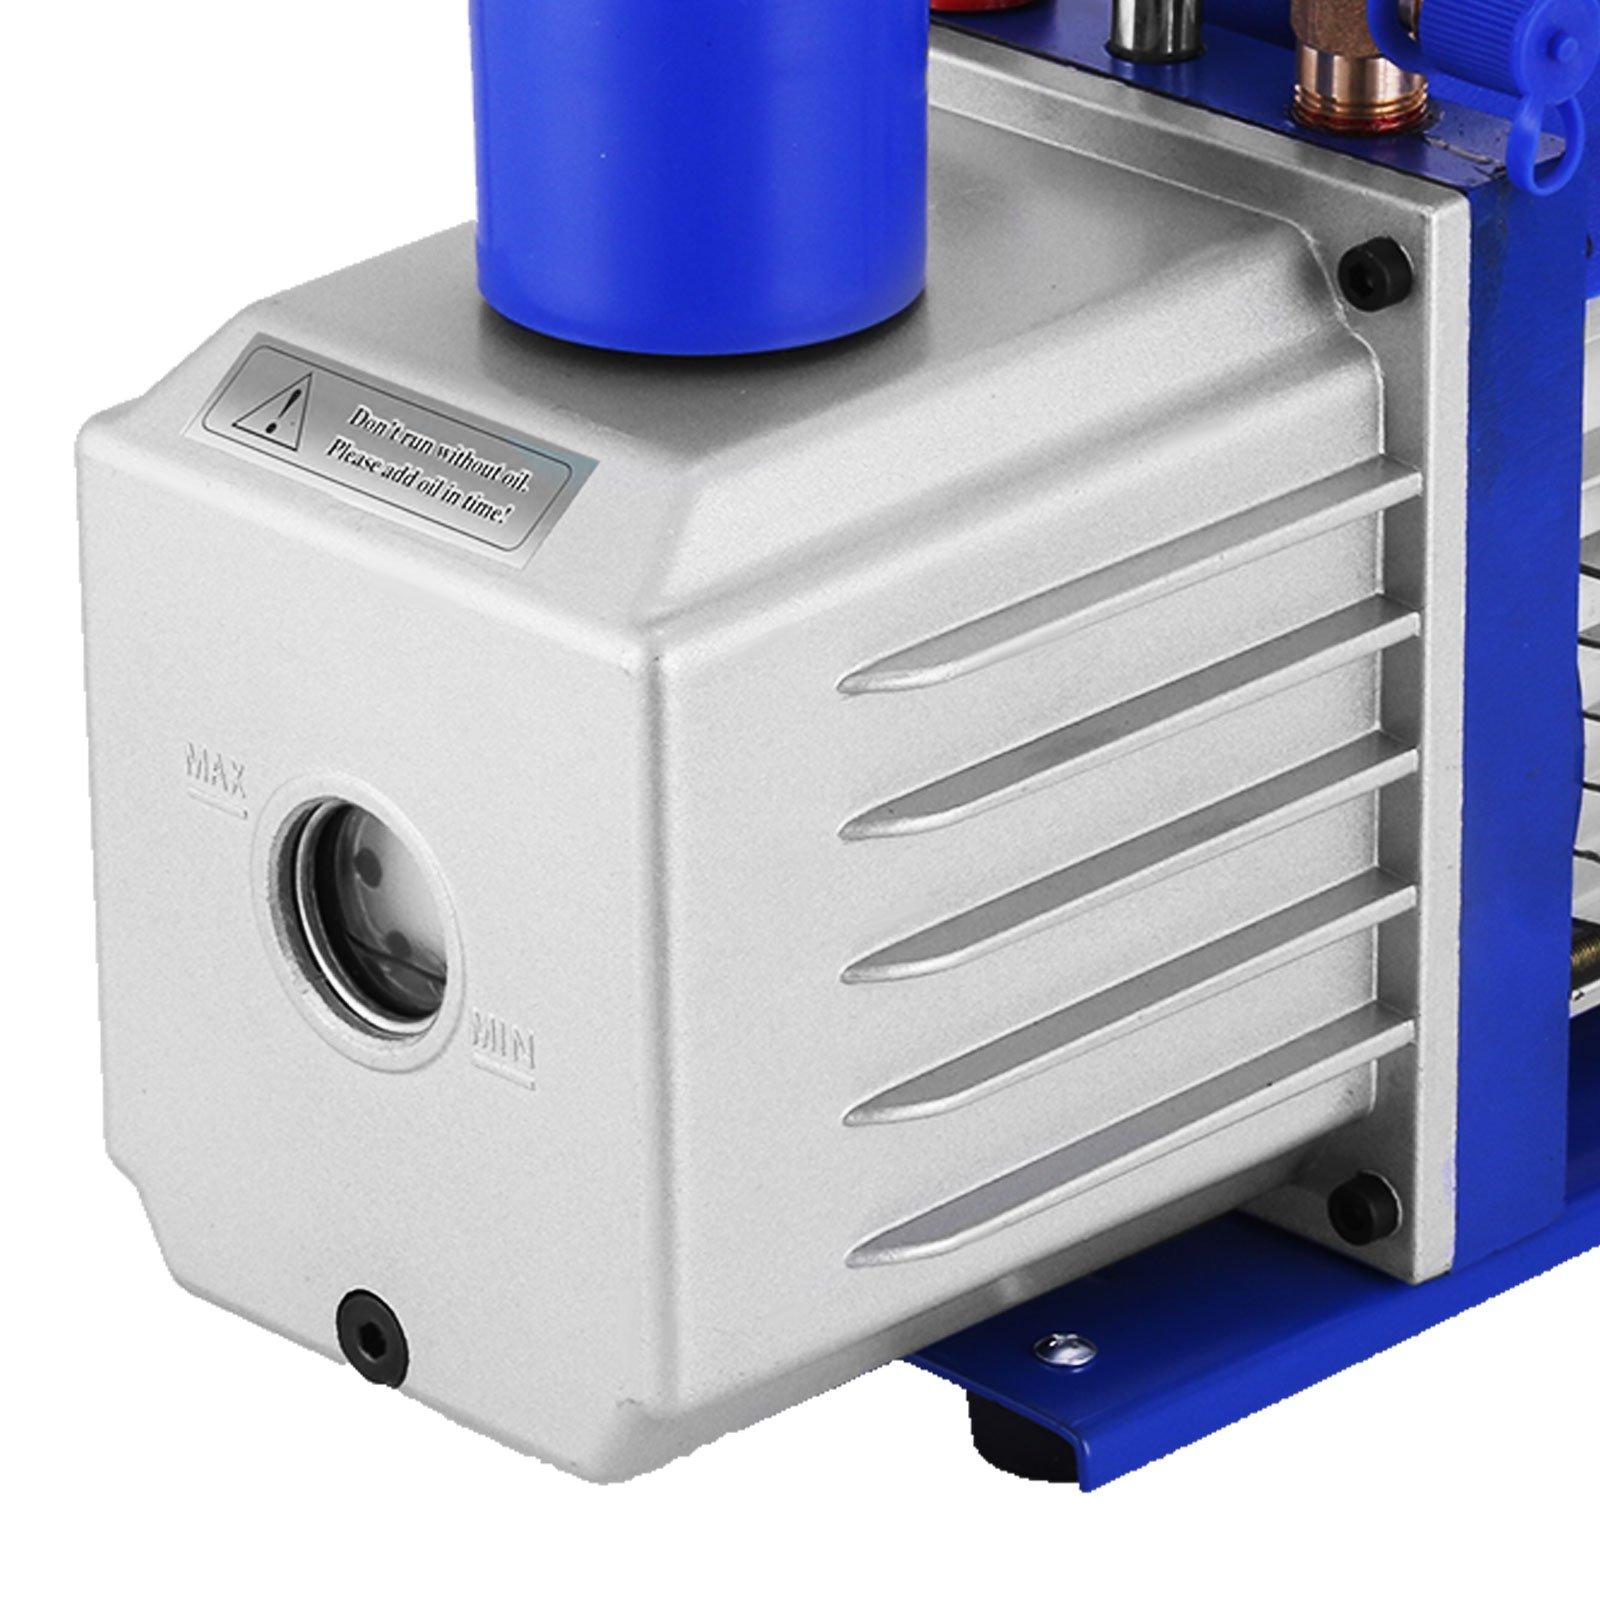 VEVOR Vacuum Pump 9CFM 1HP Two Stage HVAC Rotary Vane Vacuum Pump Wine Degassing Milking Medical Food Processing Air Conditioning Auto AC Refrigerant Vacuum Pump (2-Stage, 9CFM) by VEVOR (Image #6)